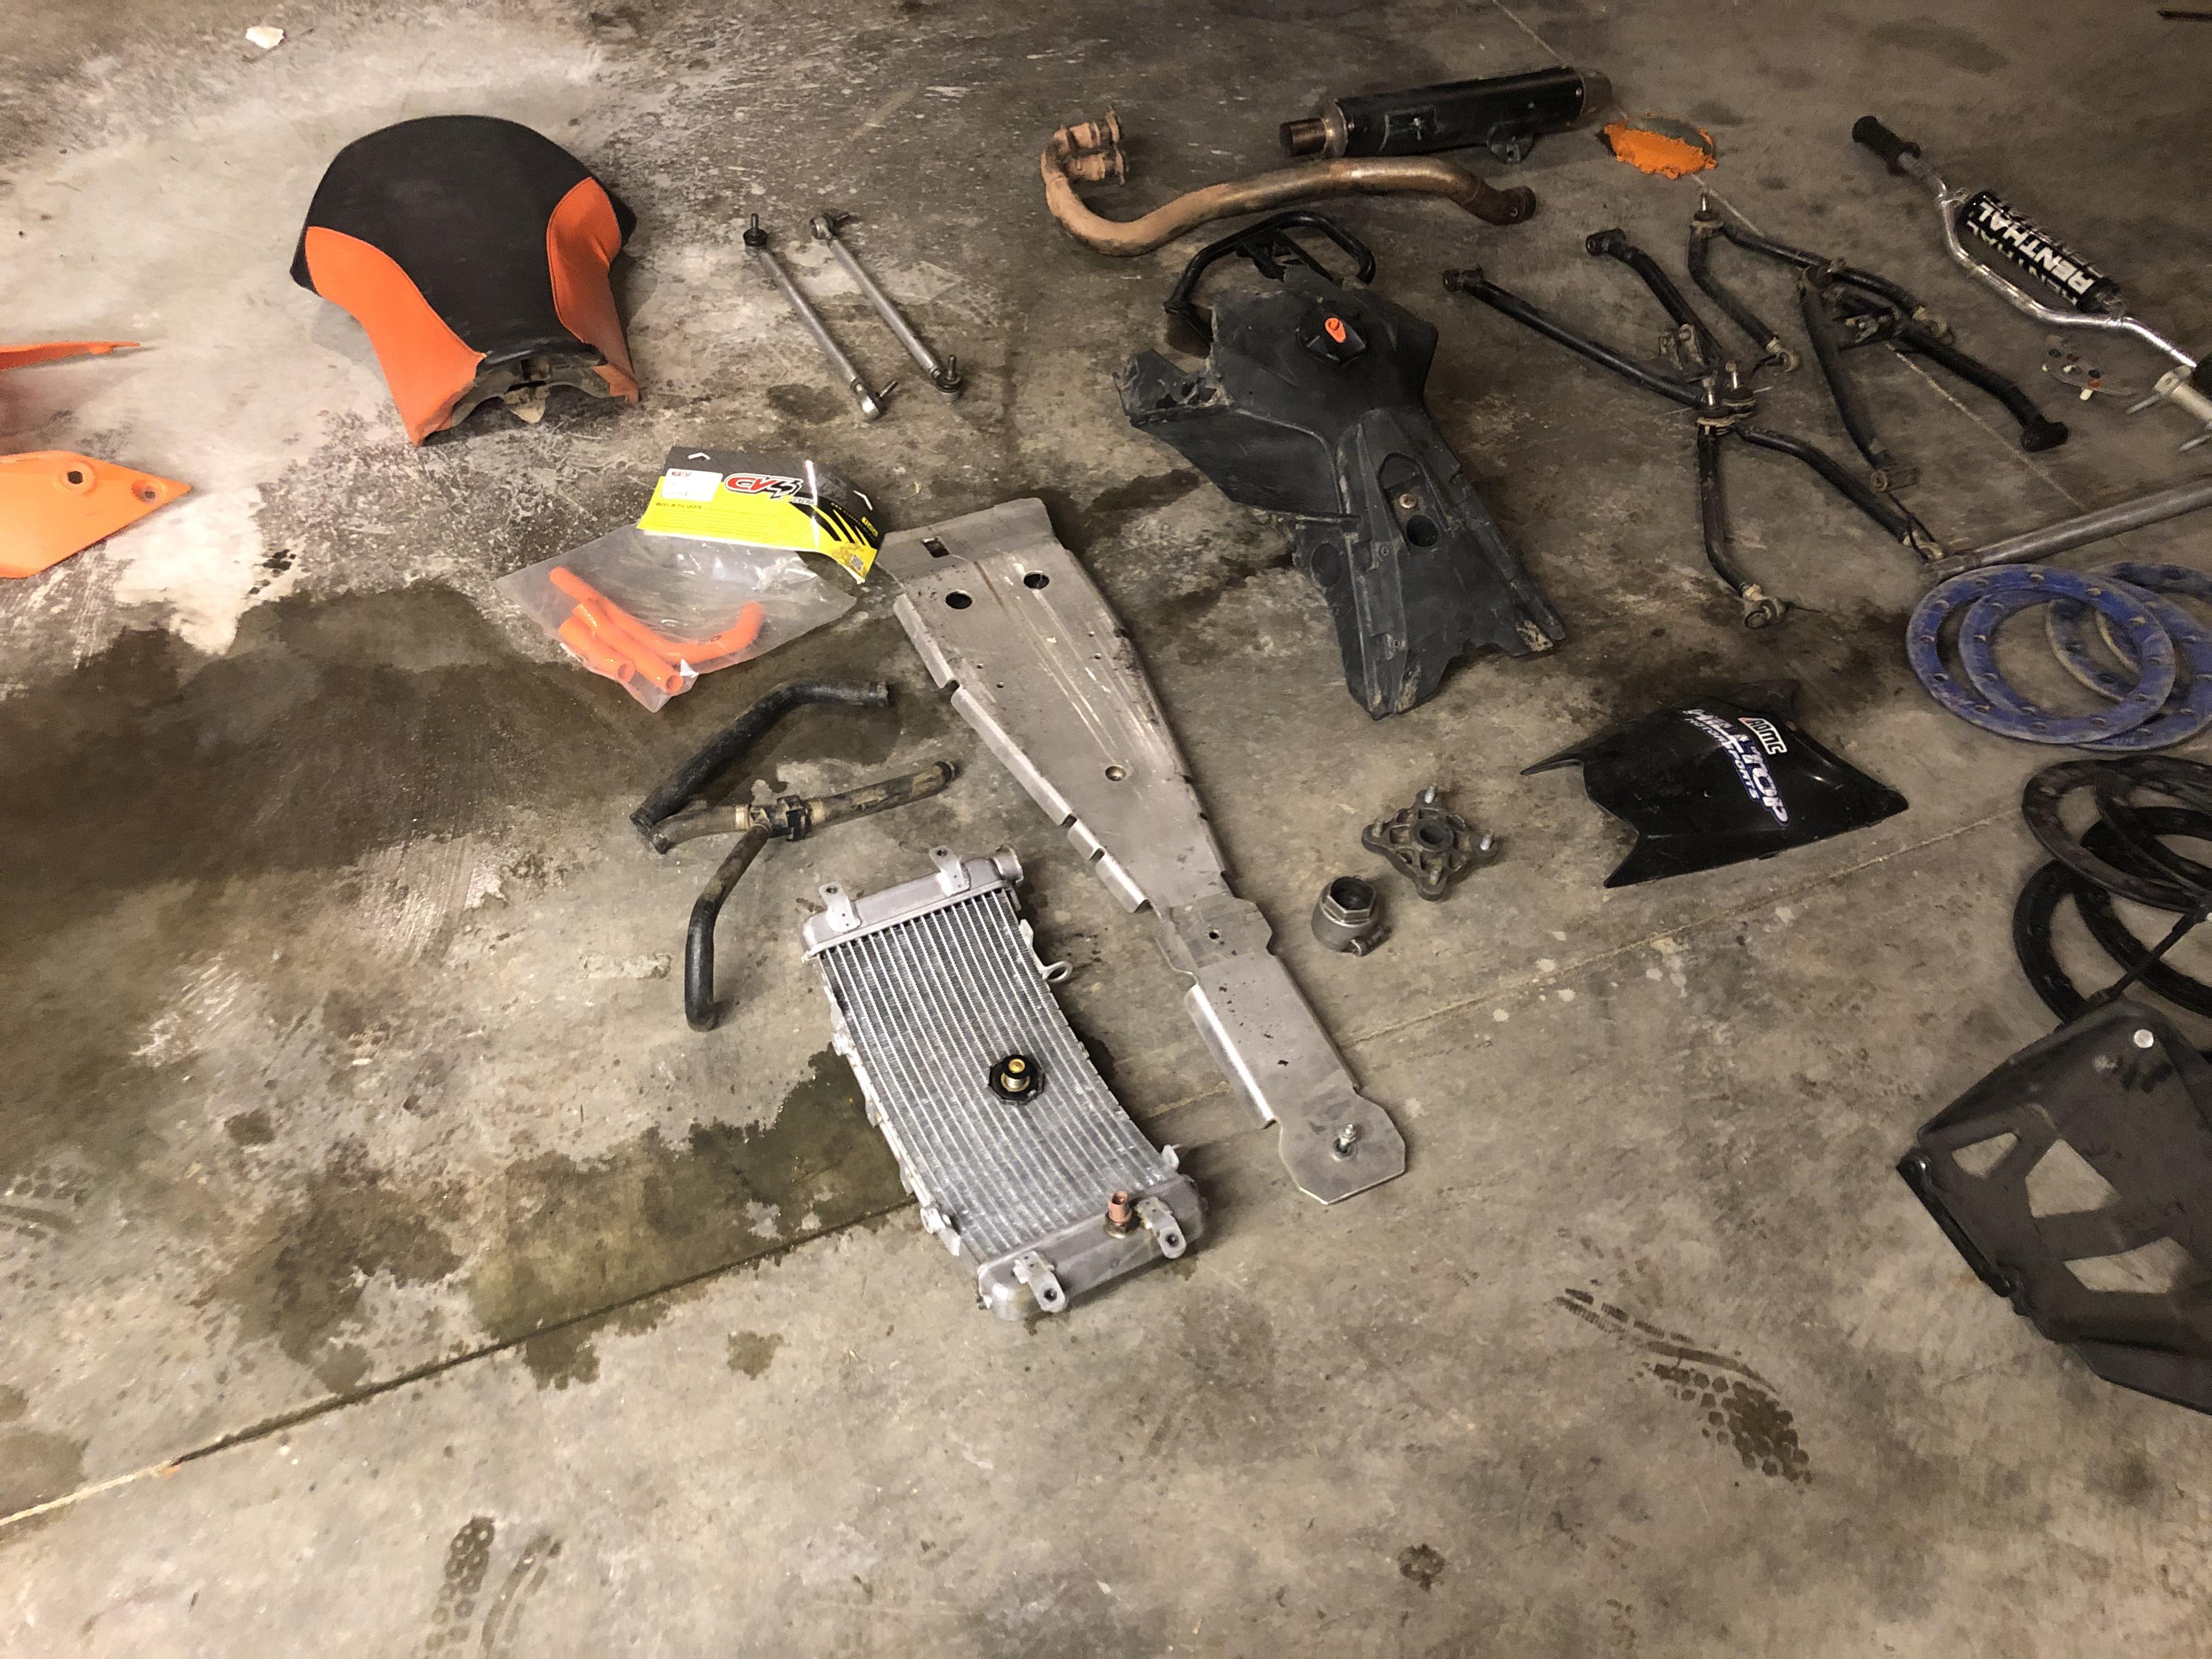 Parts for sale-c11793fd-174f-4296-a98e-a2ac60e56541.jpeg